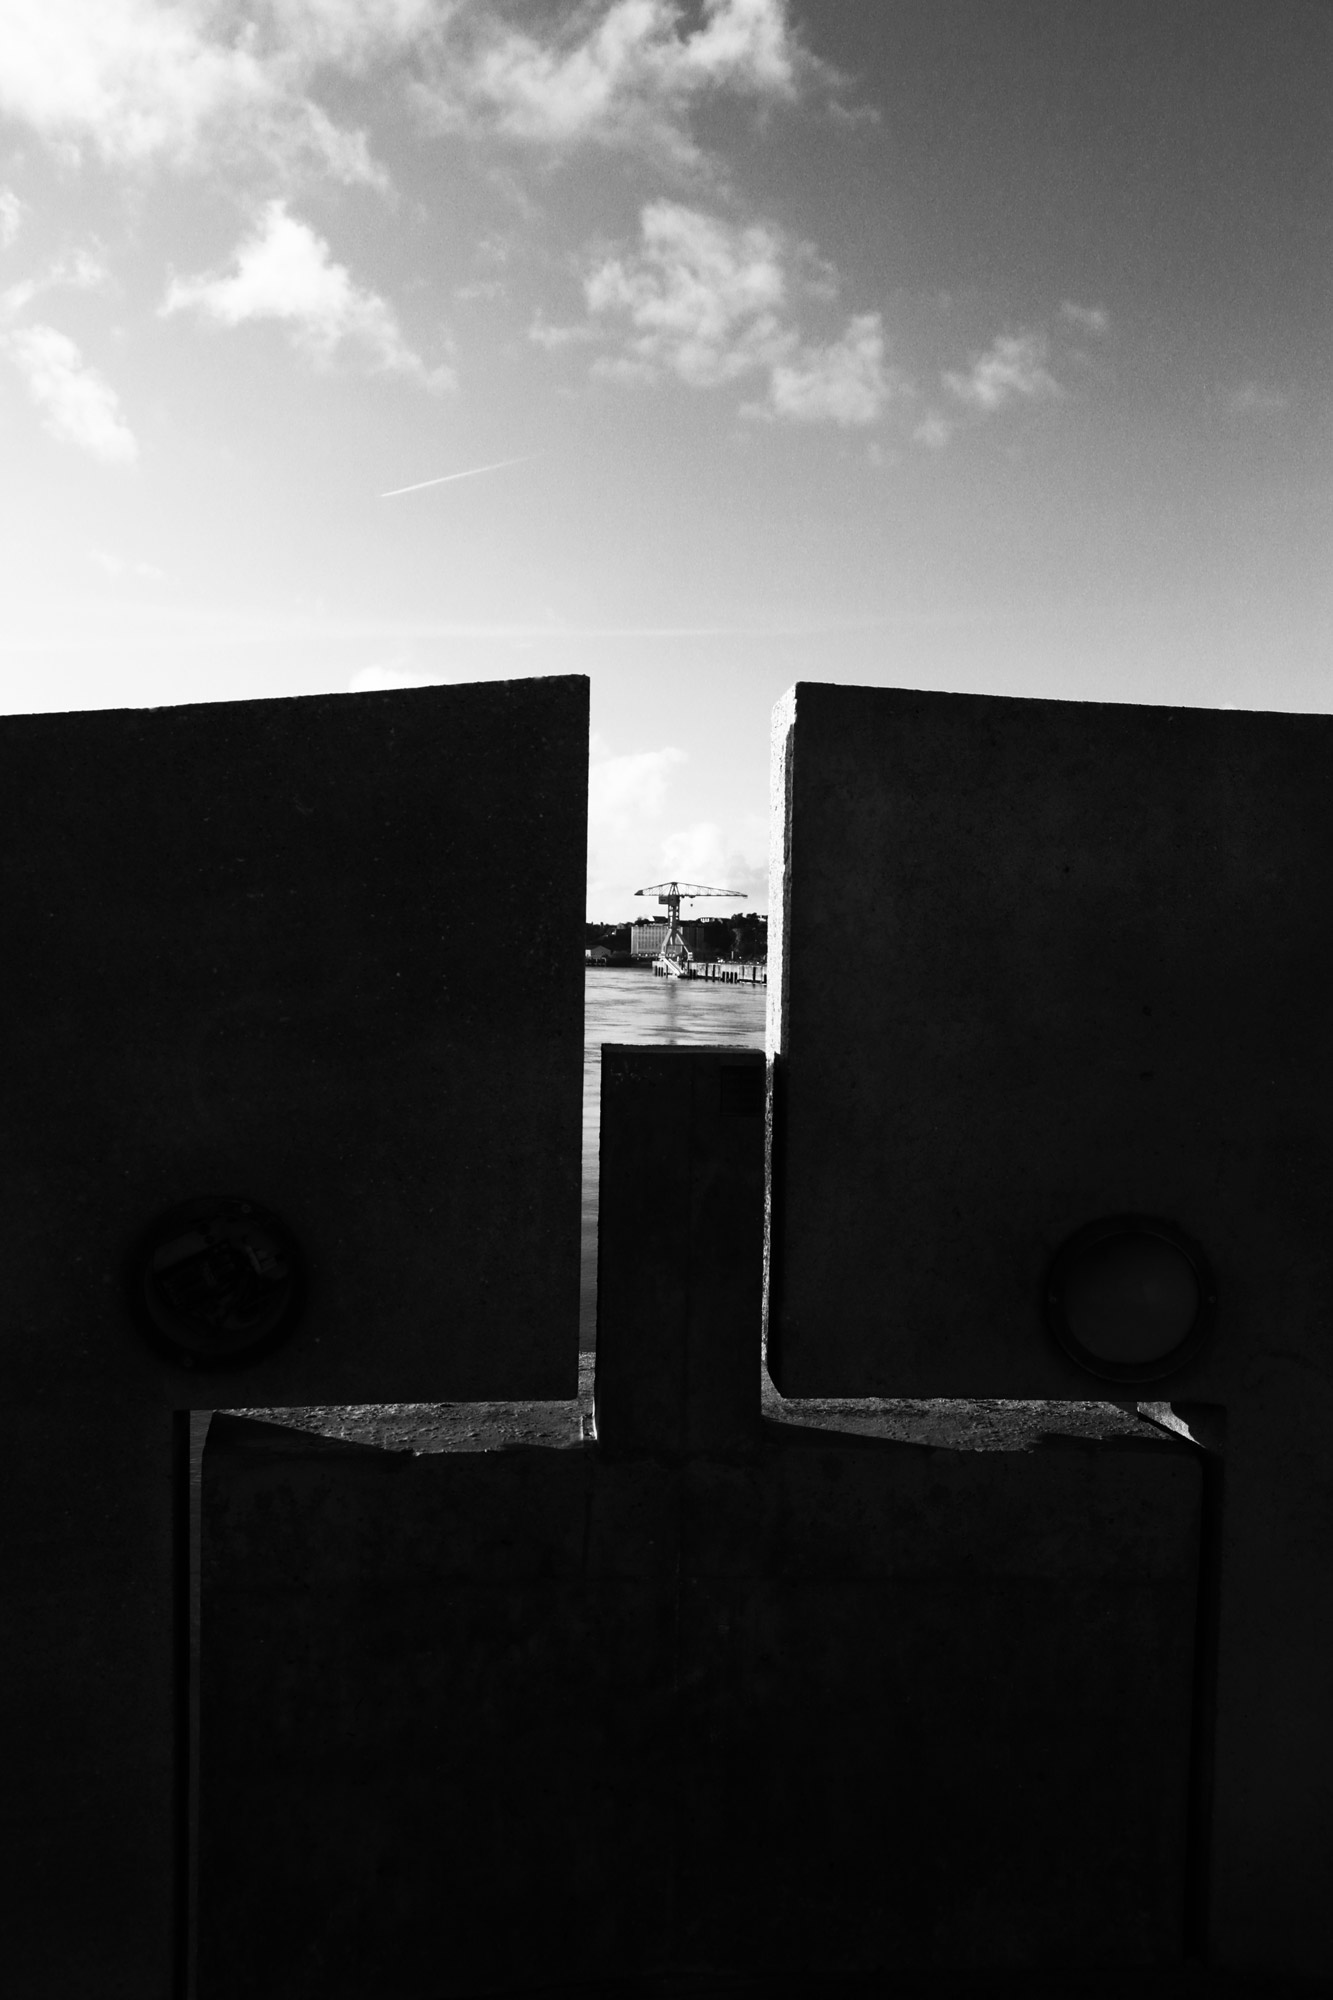 """Away"" - Pont des 3 Continents, Nantes. ©Clémence Rougetet"